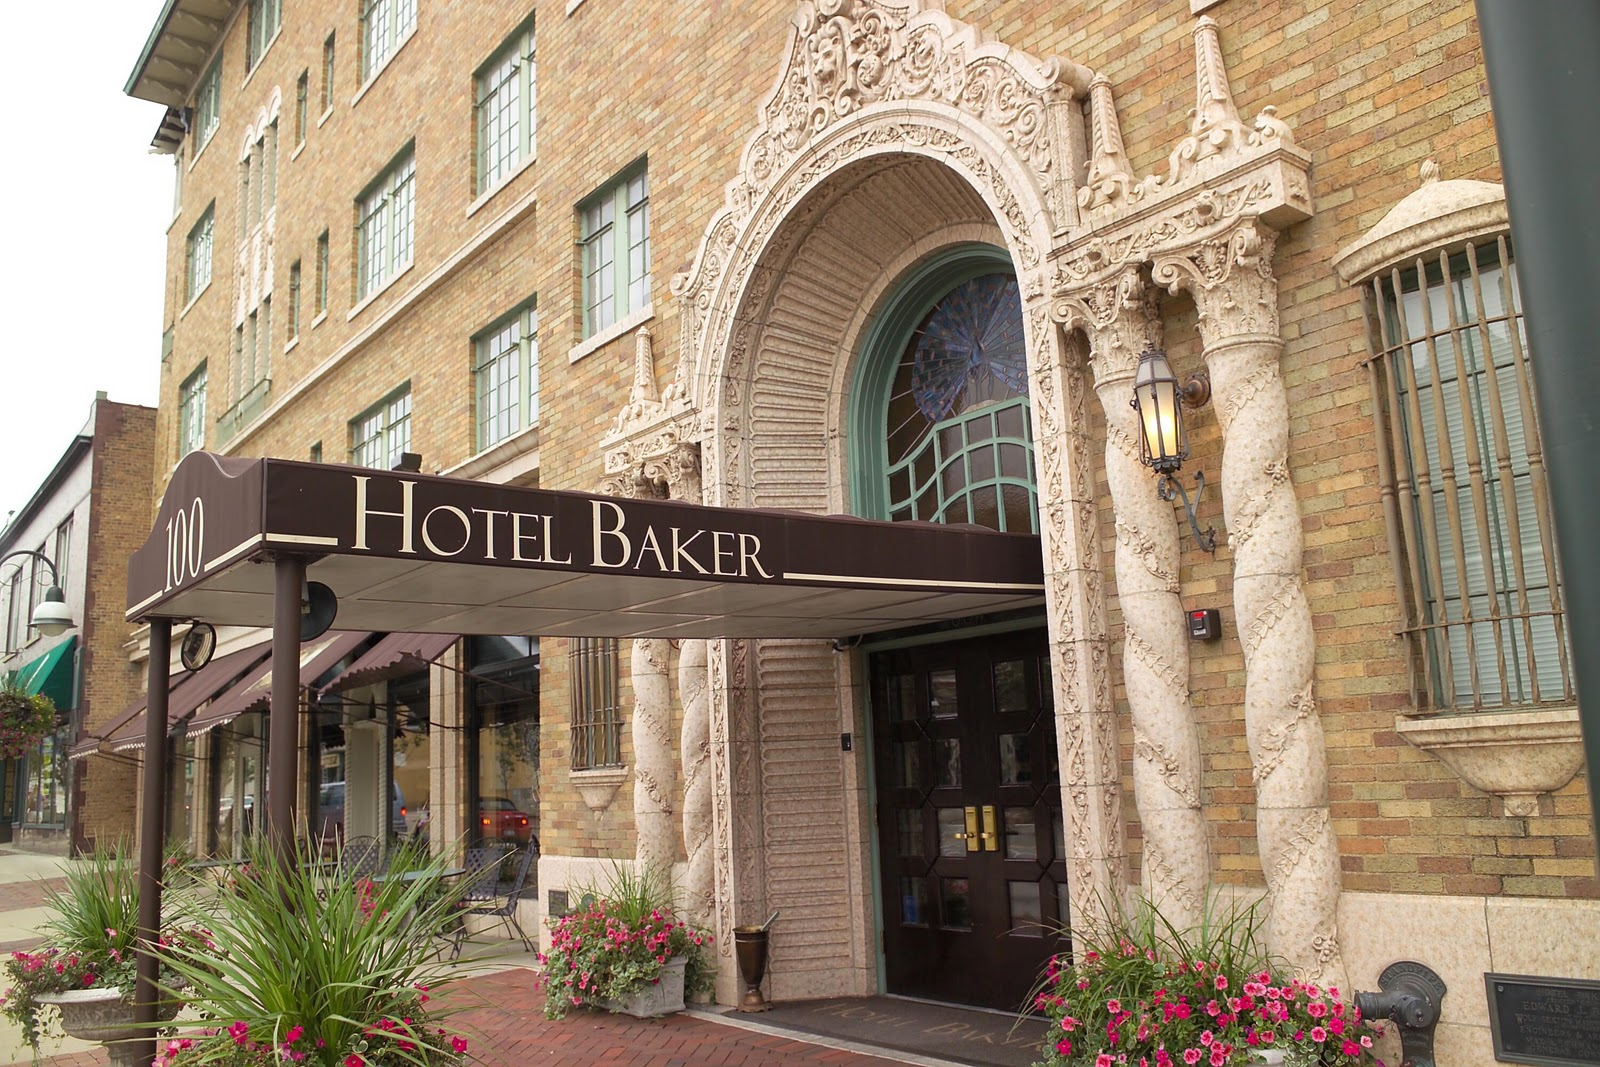 Hotel Baker: January 2011